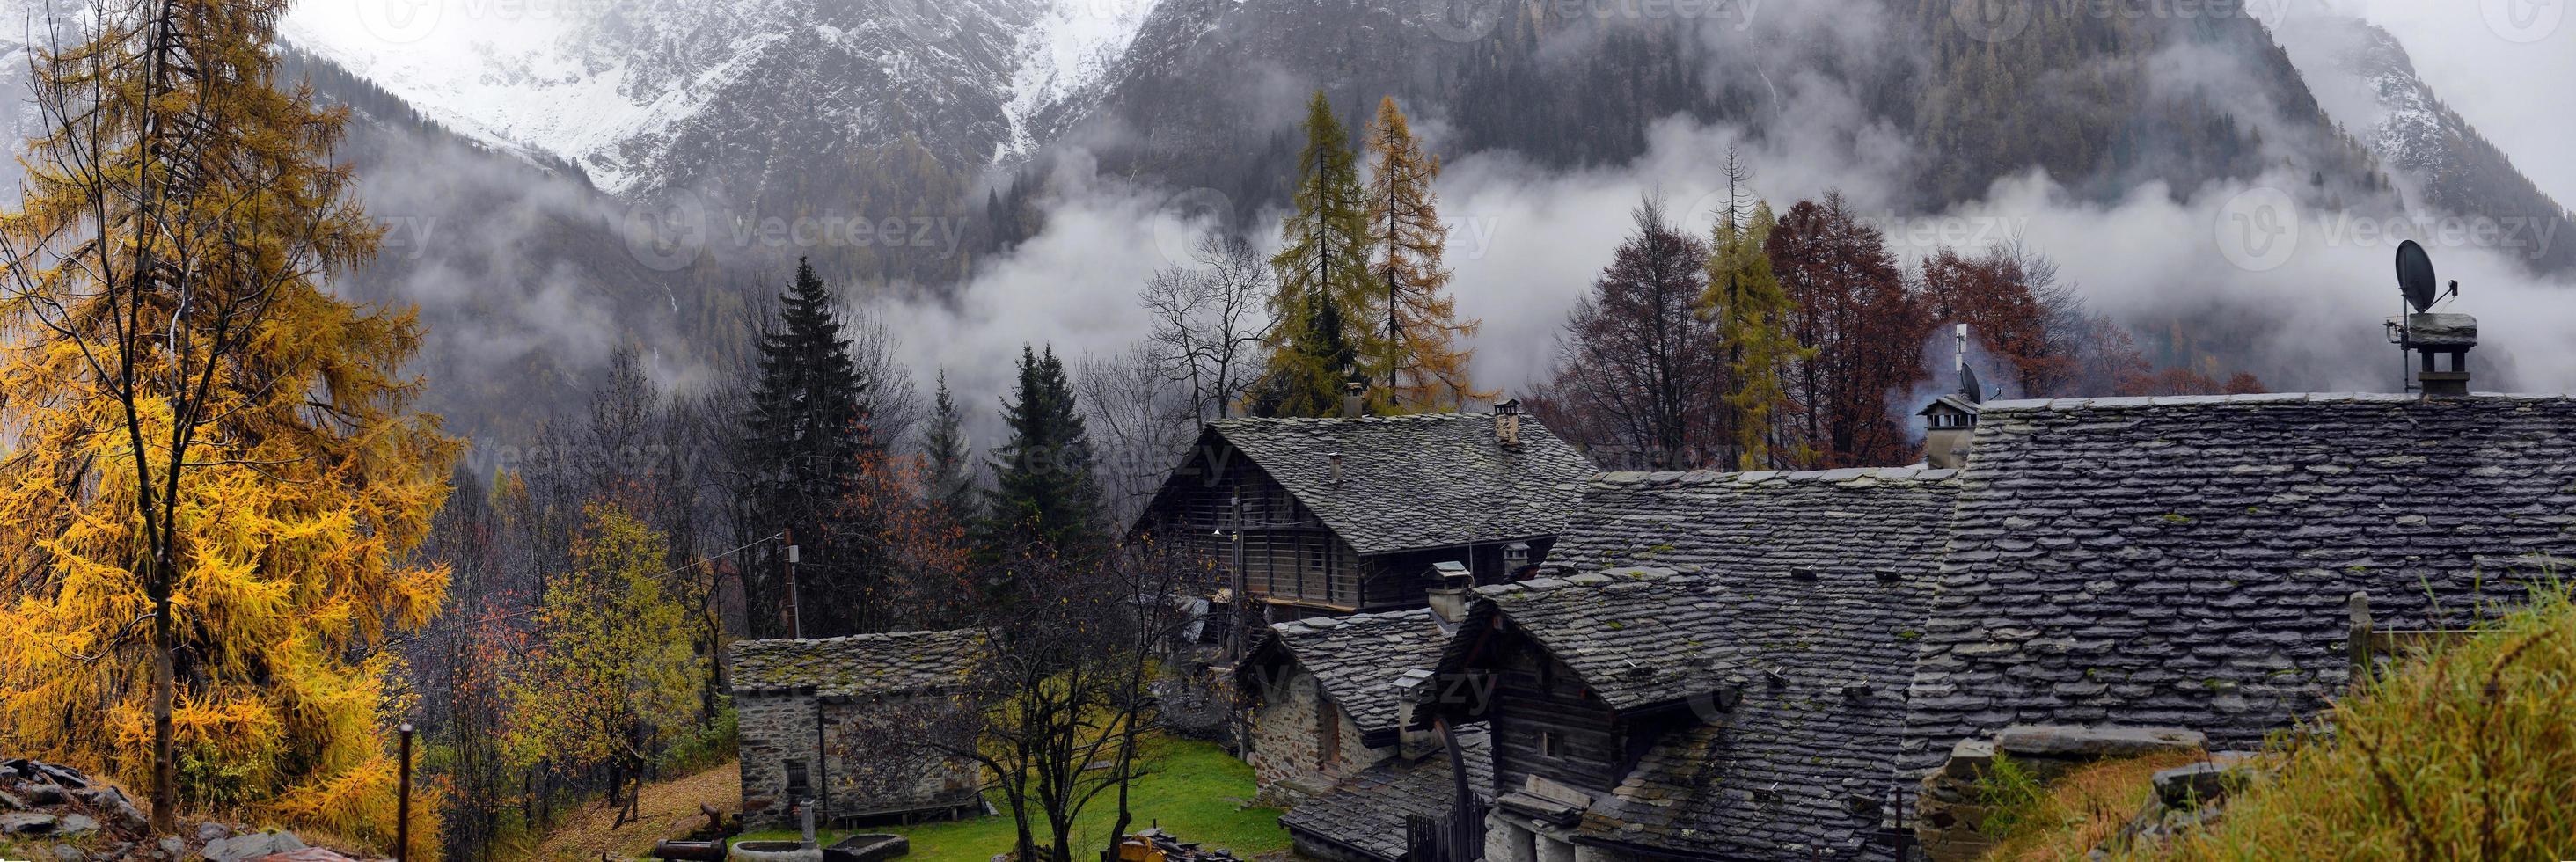 panorama alpin depuis le petit village photo